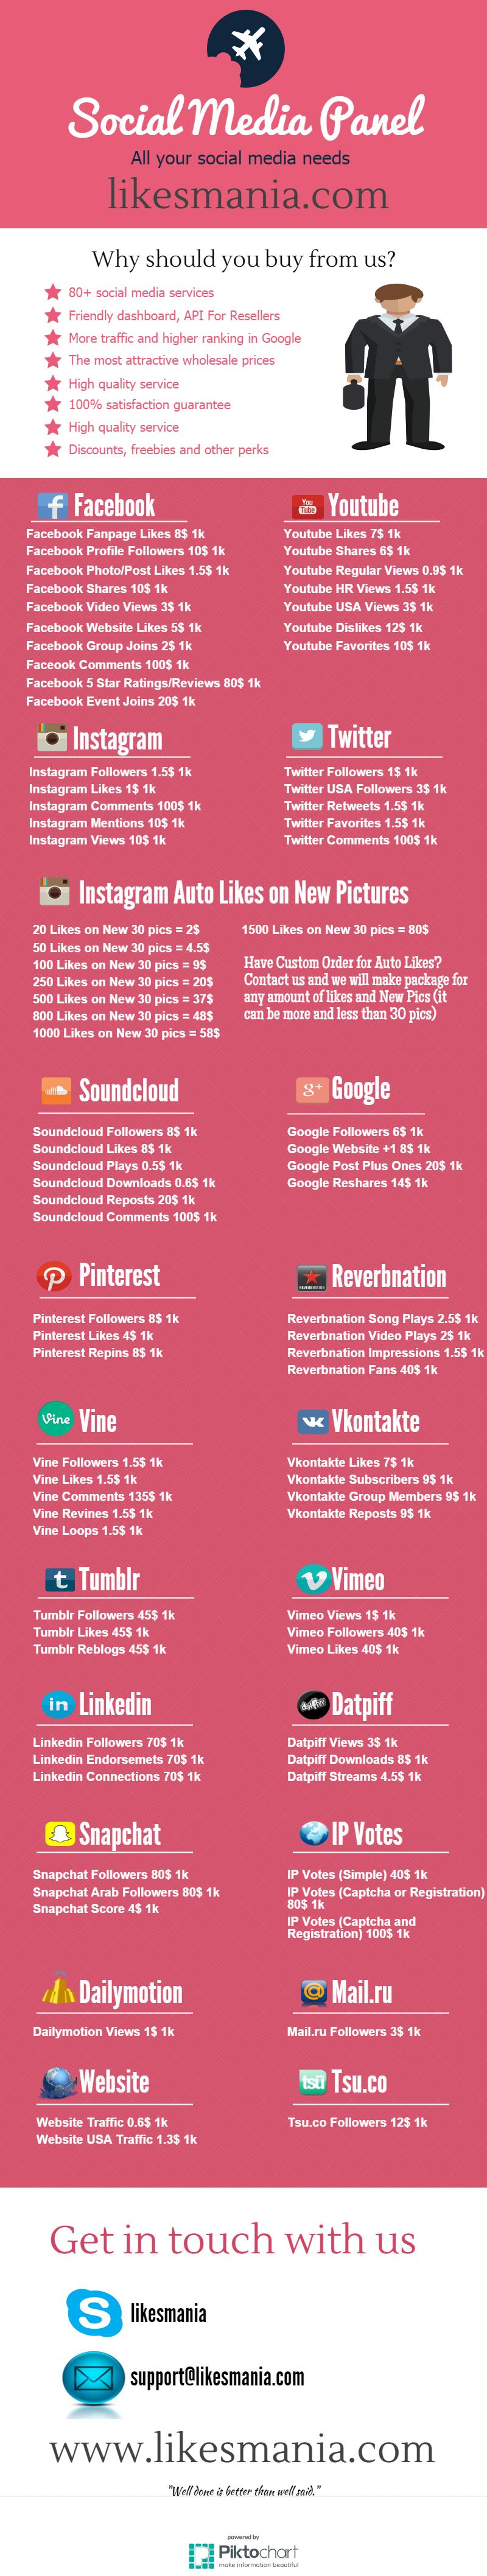 The Biggest SMM Panel Youtube - Facebook - Instagram